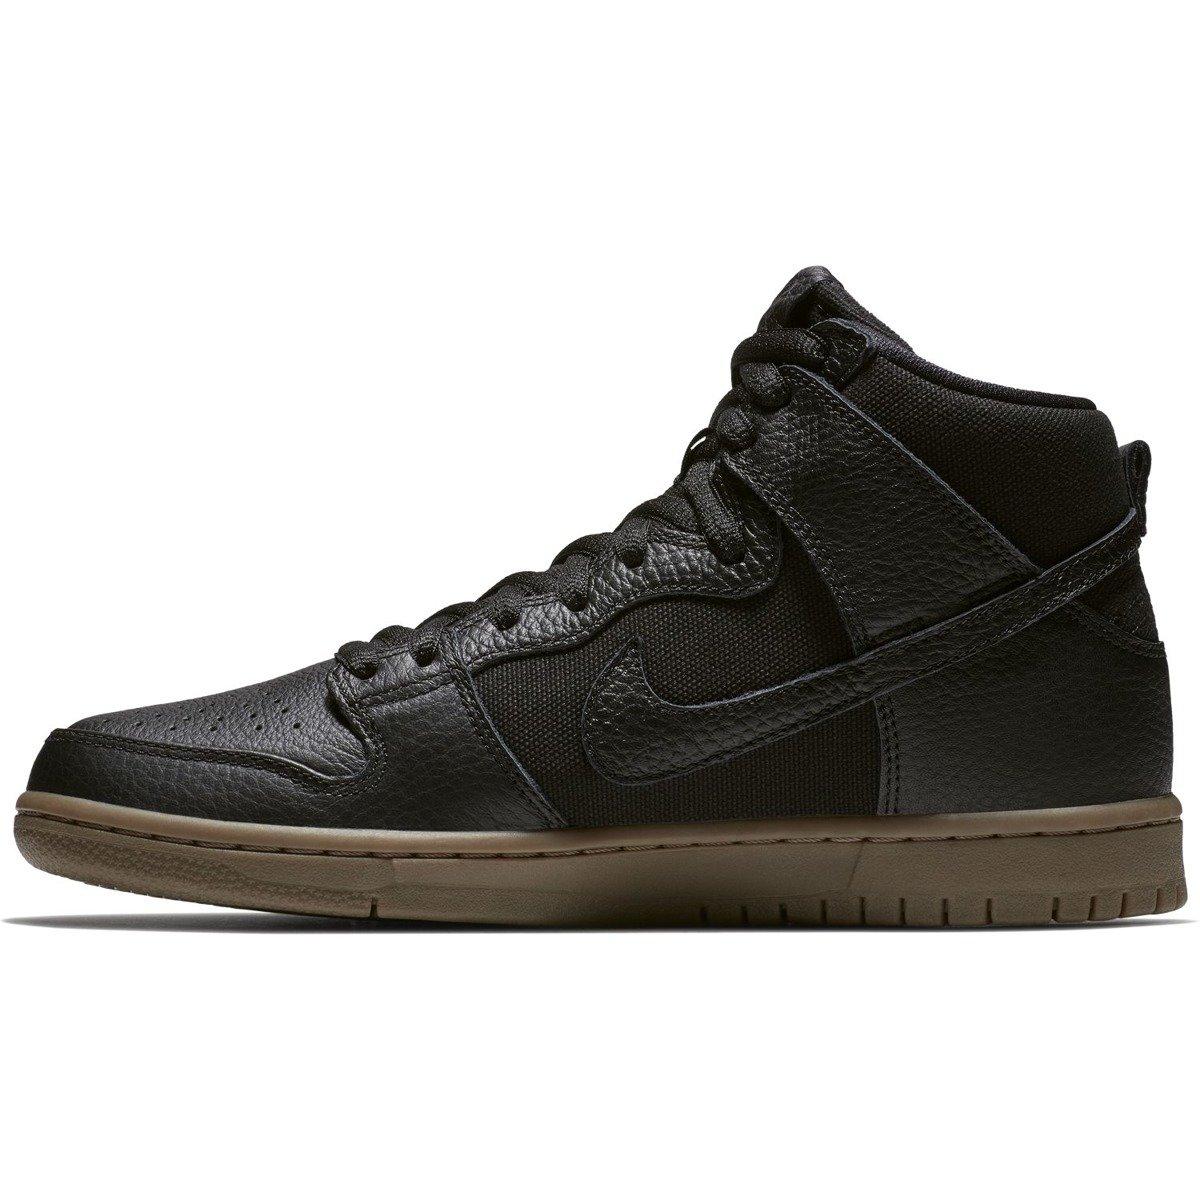 Nike Spring Shoes Price